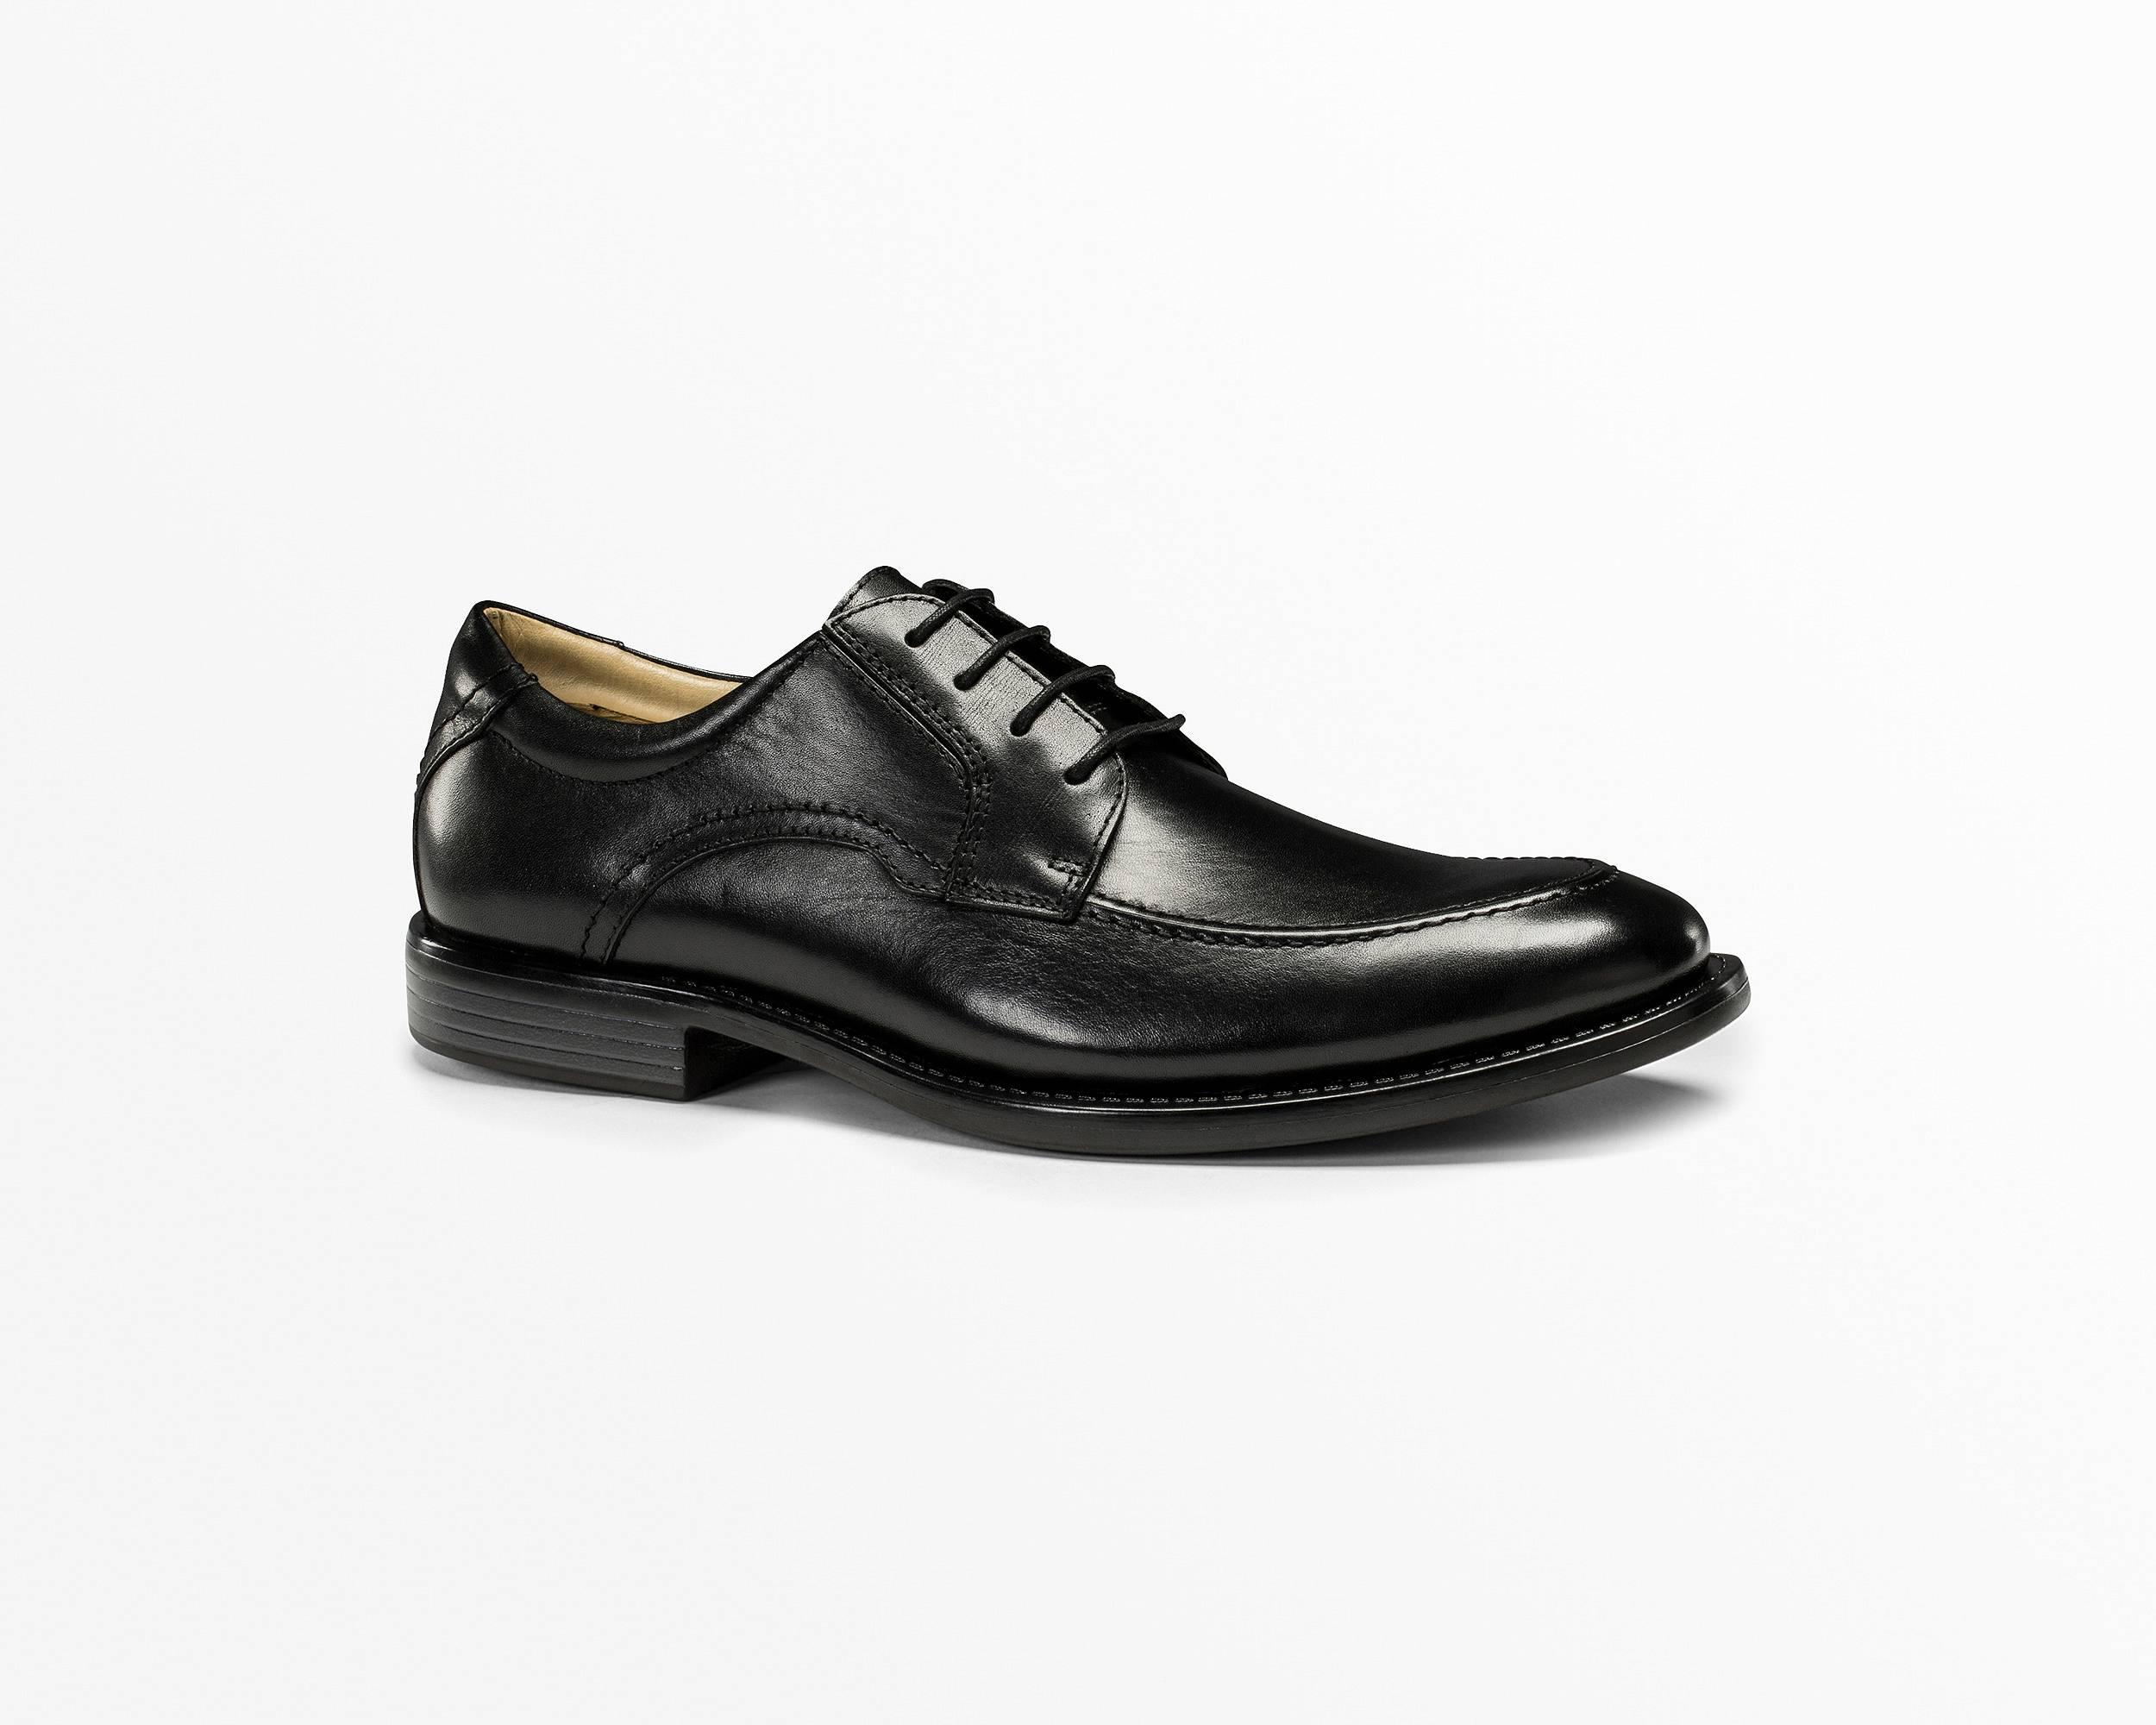 Dockers Black Split Toe Dress Shoes